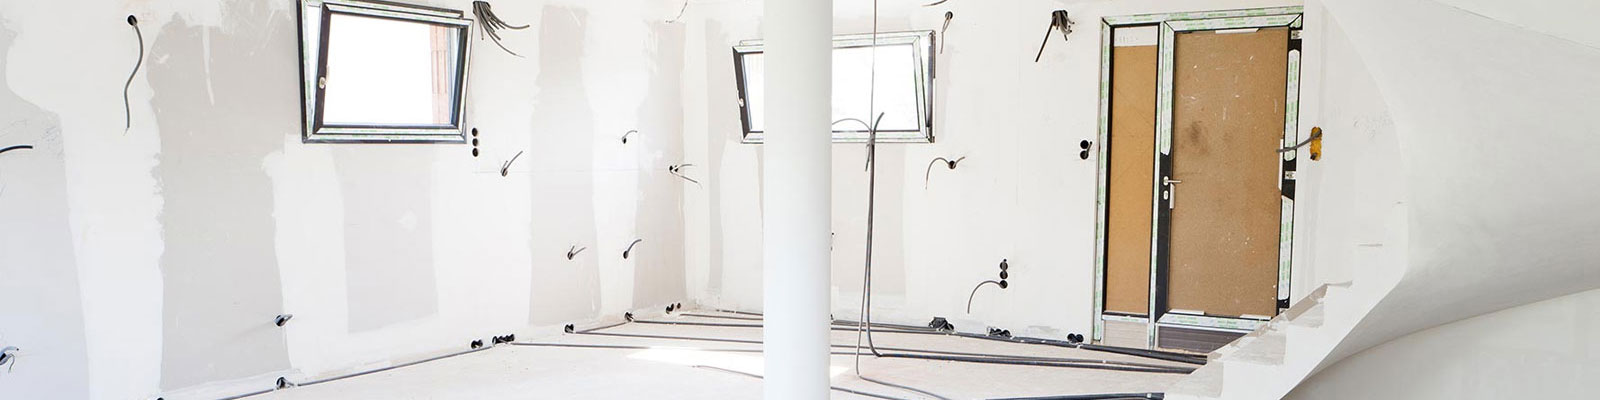 installation lectrique fabelec electricit chauffage domotique alarmes morestel. Black Bedroom Furniture Sets. Home Design Ideas